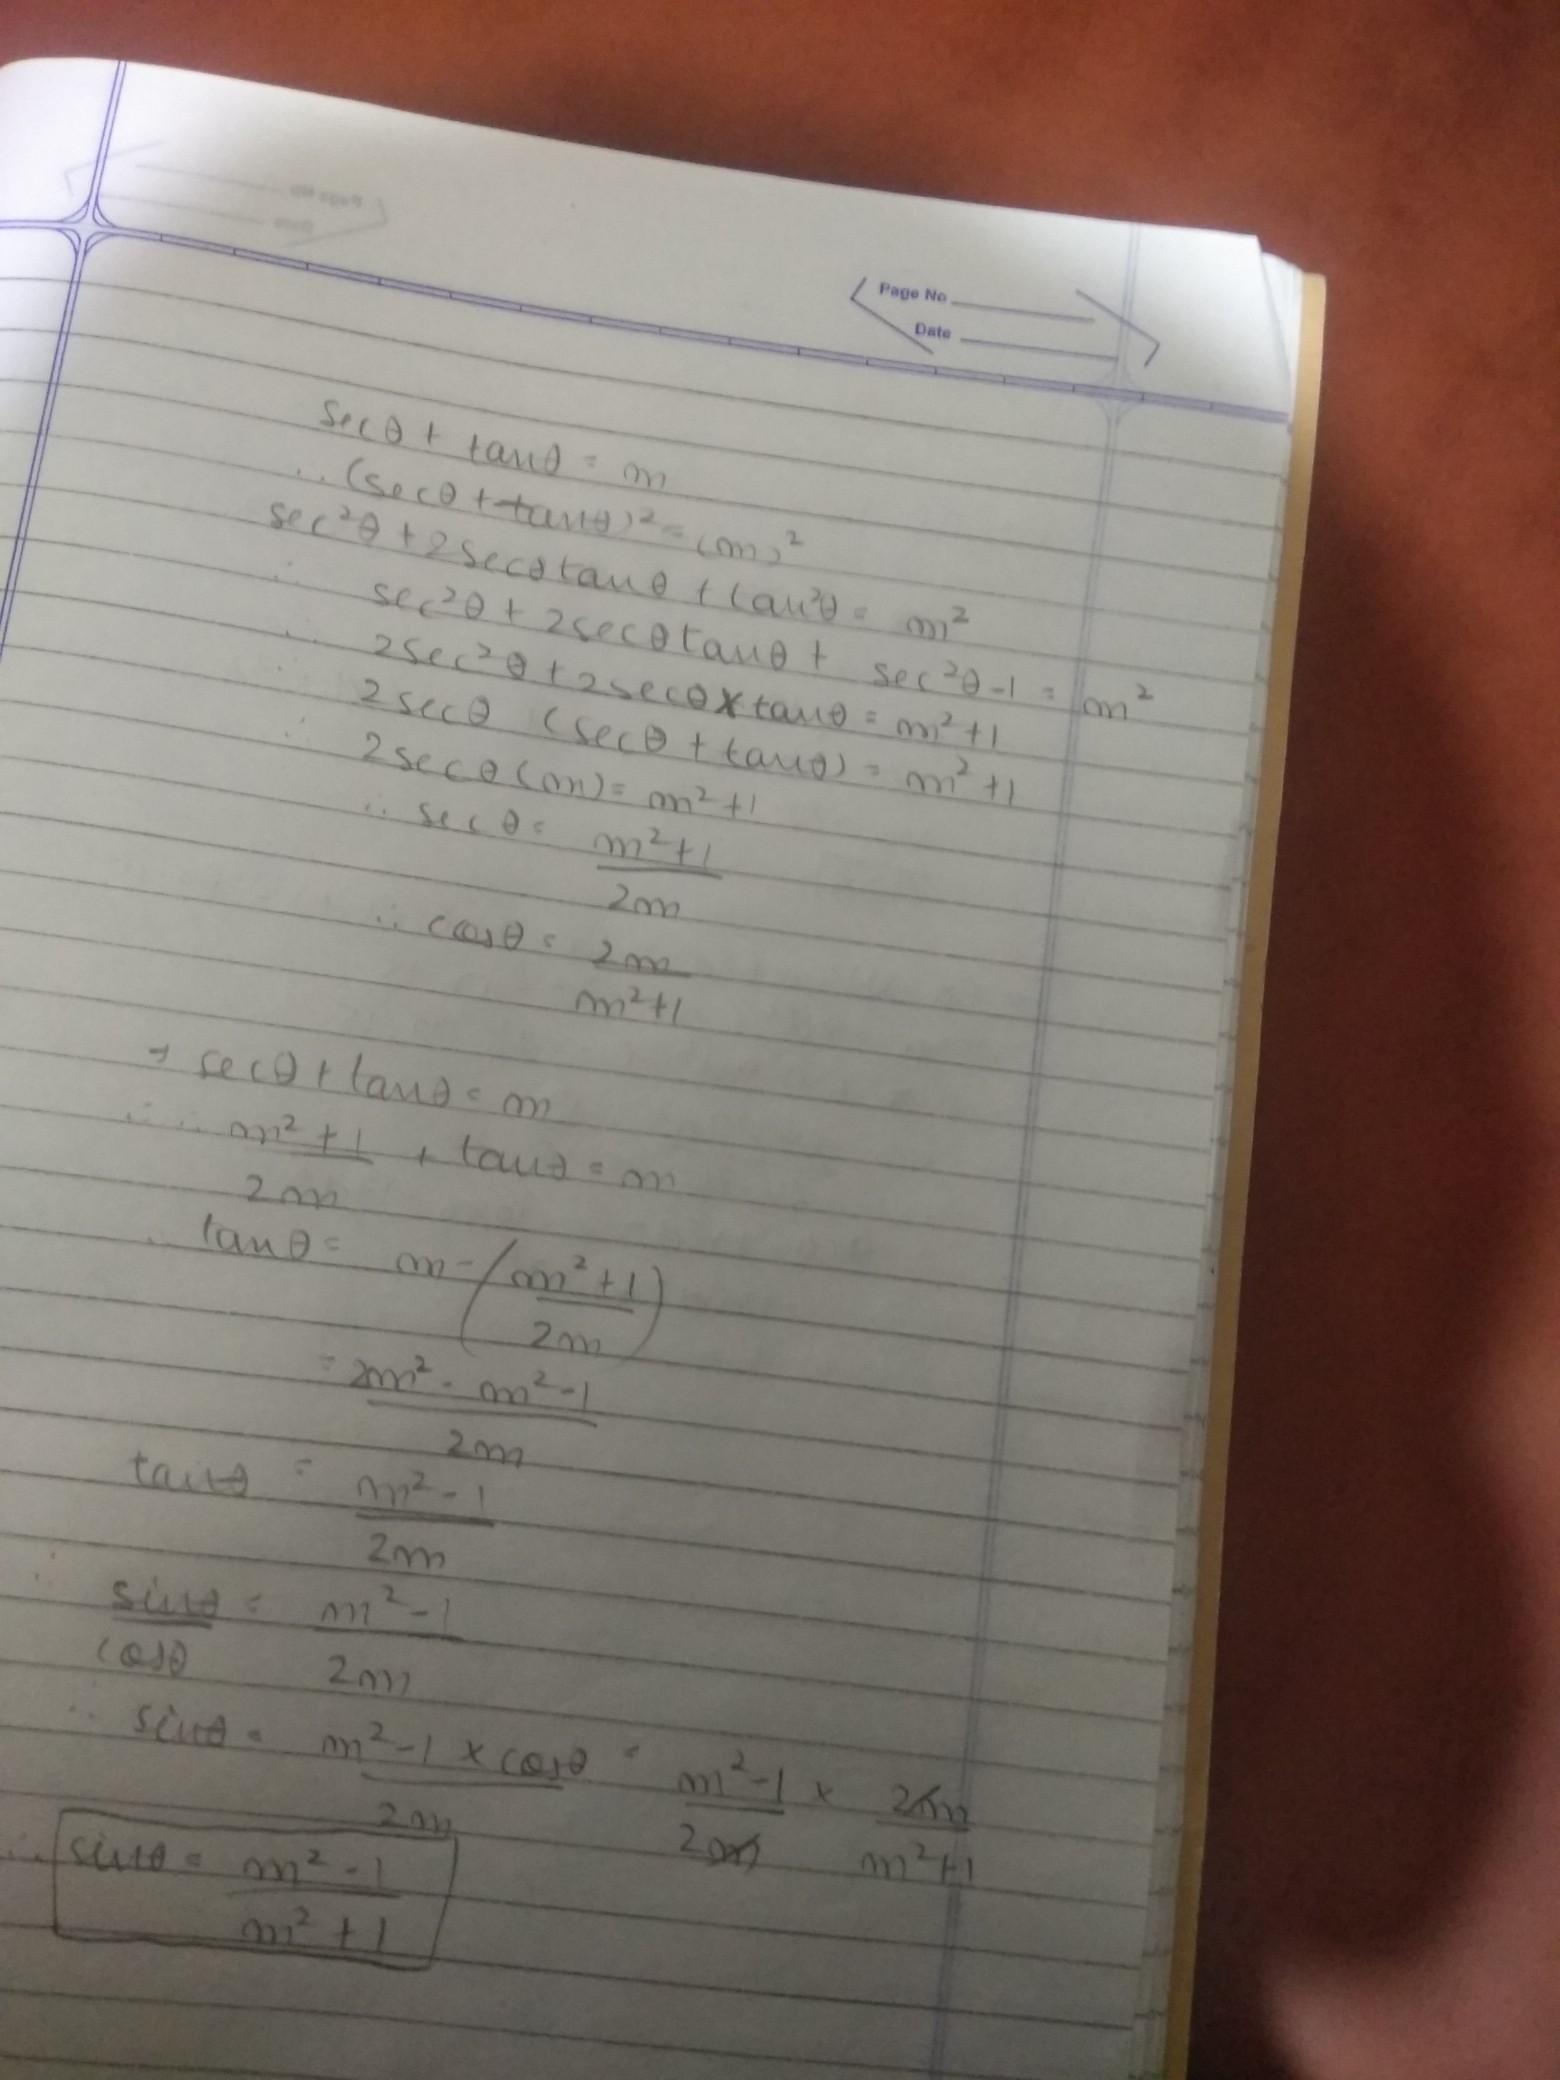 Sec theta + tan theta = m show that (m2-1/ m2+1) = sin theta